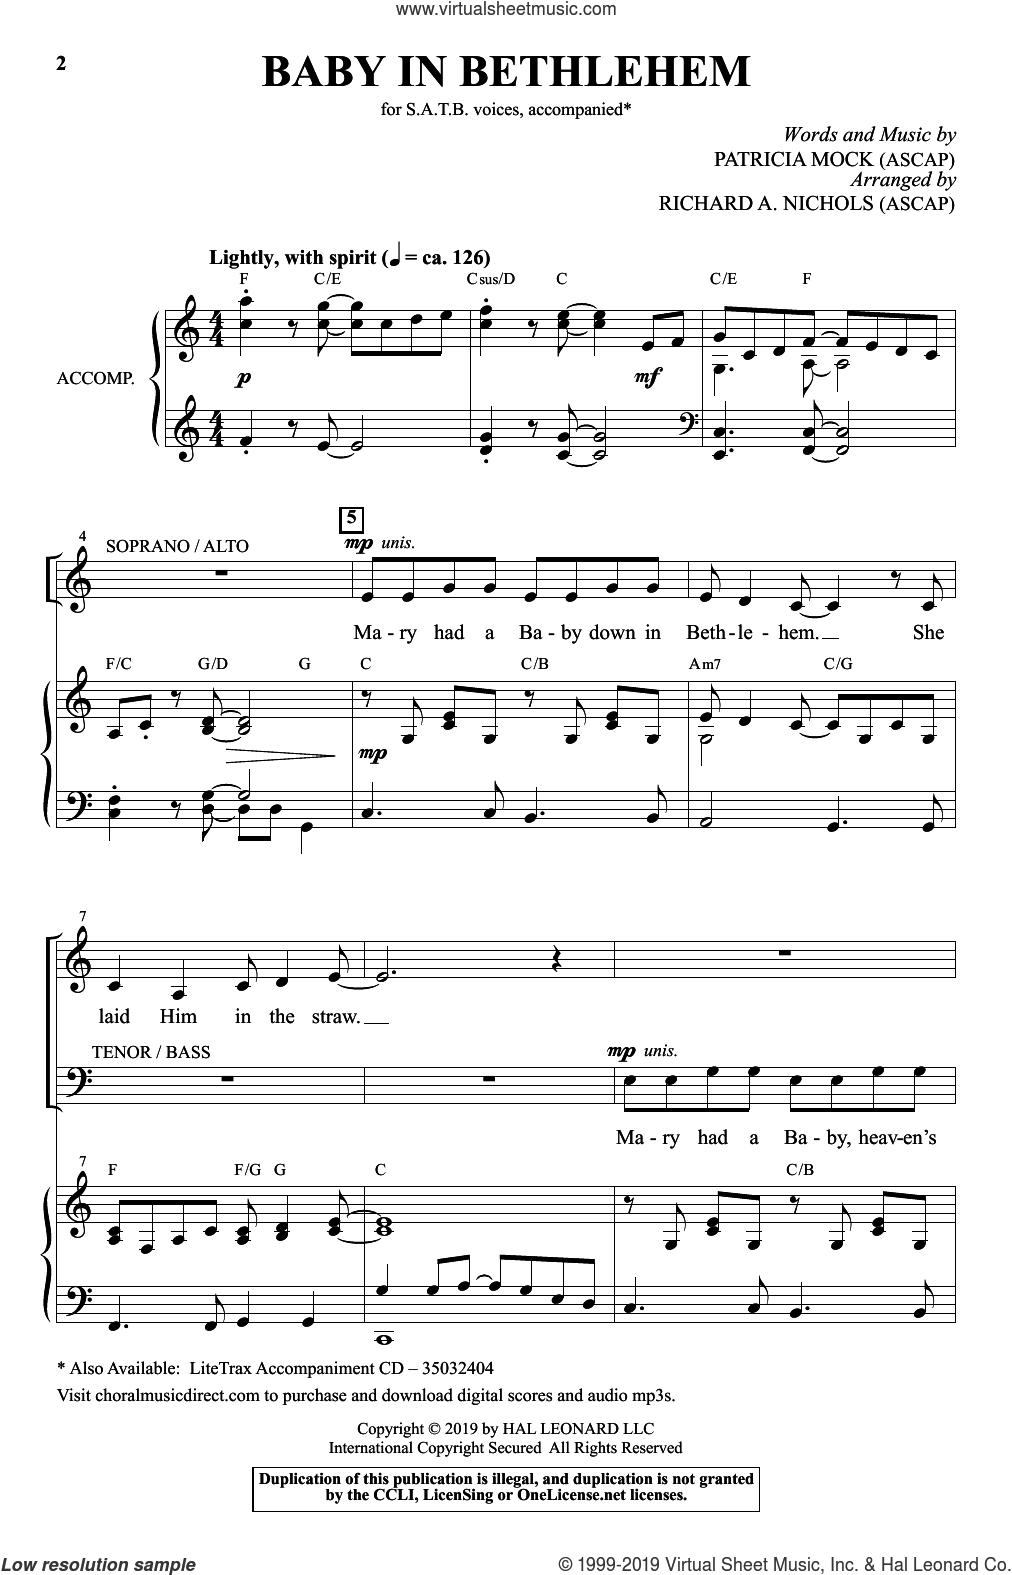 Baby In Bethlehem (arr. Richard A. Nichols) sheet music for choir (SATB: soprano, alto, tenor, bass) by Patricia Mock and Richard A. Nichols, intermediate skill level